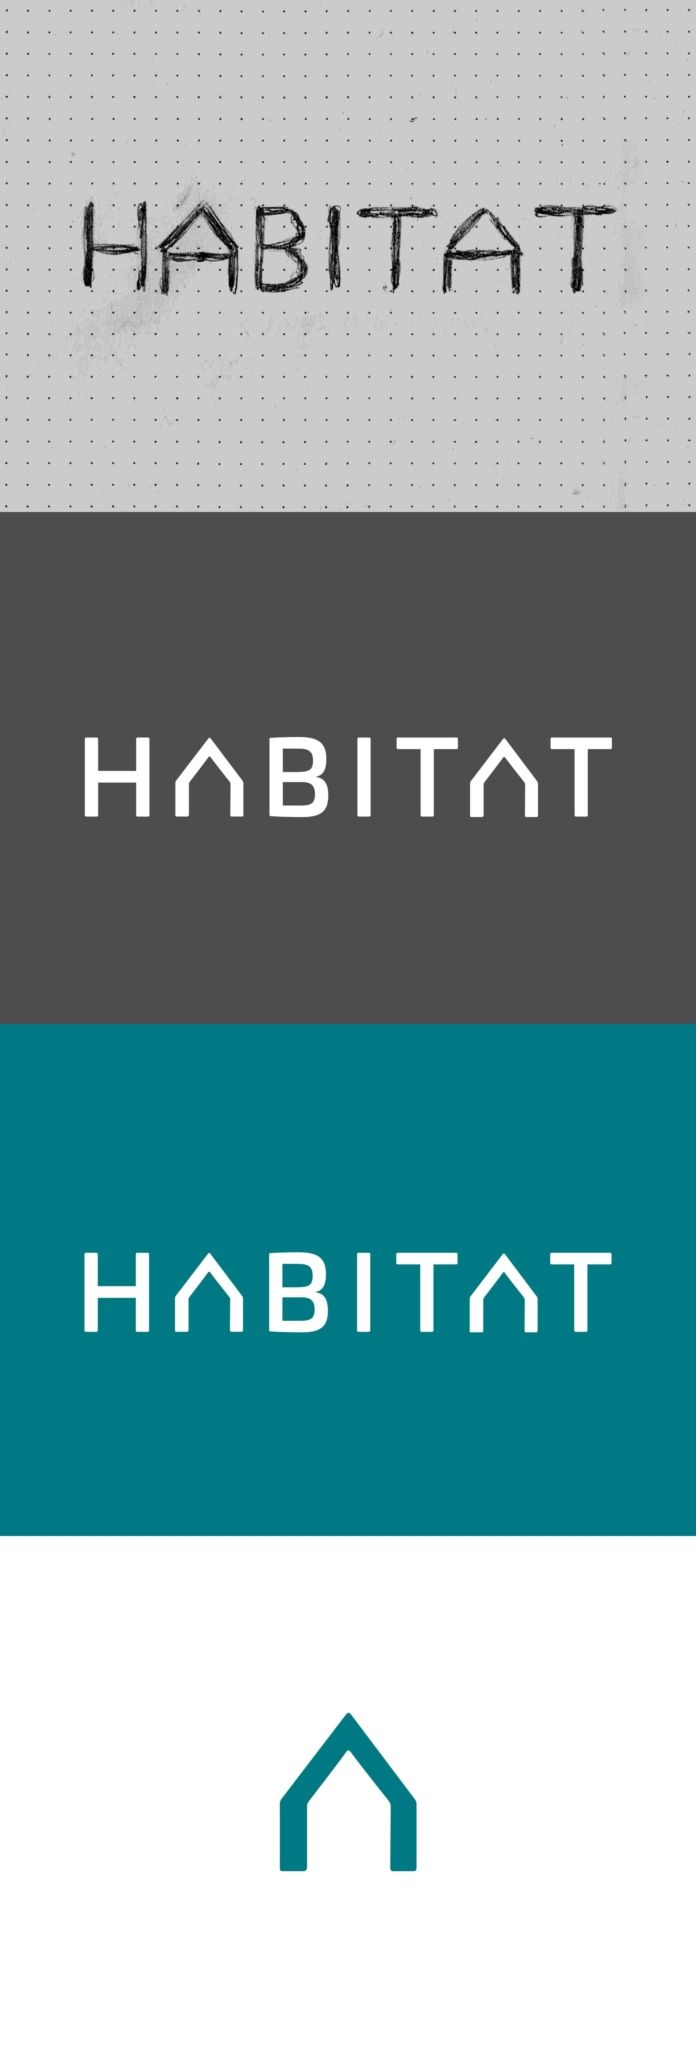 HABITAT logo design type version. This was my second proposal for the new HABITAT logo. #logodesign #logotype #logoproces